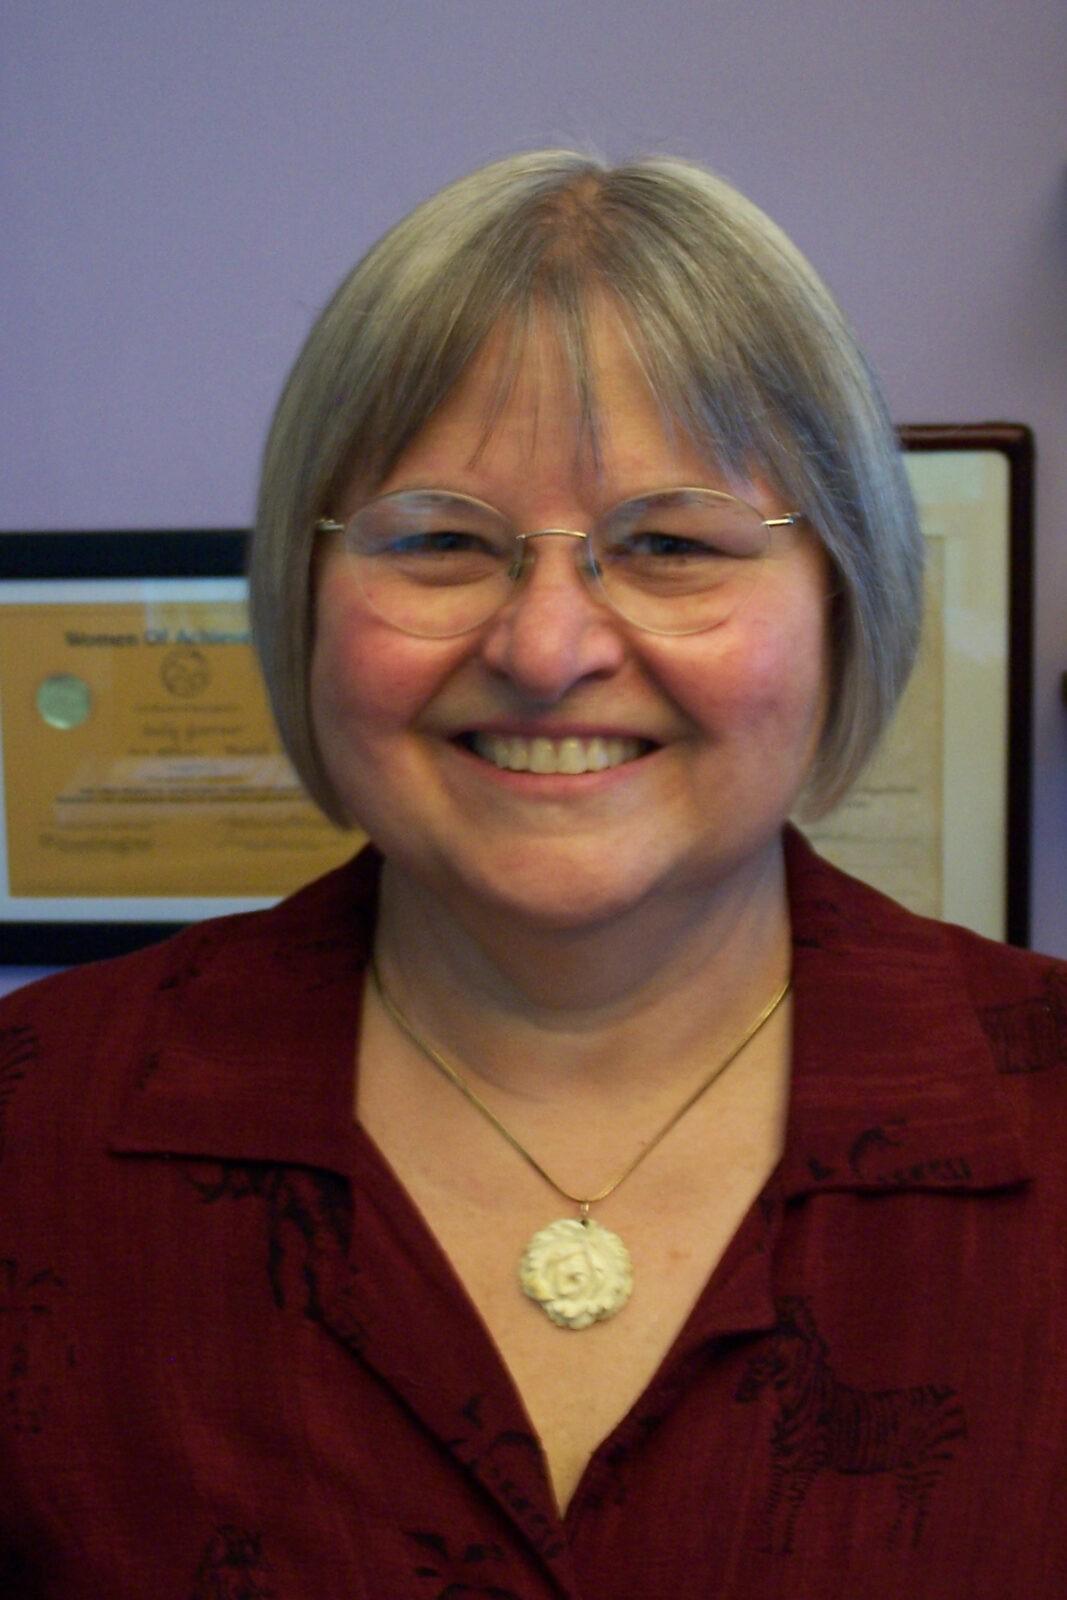 Sally Goerner